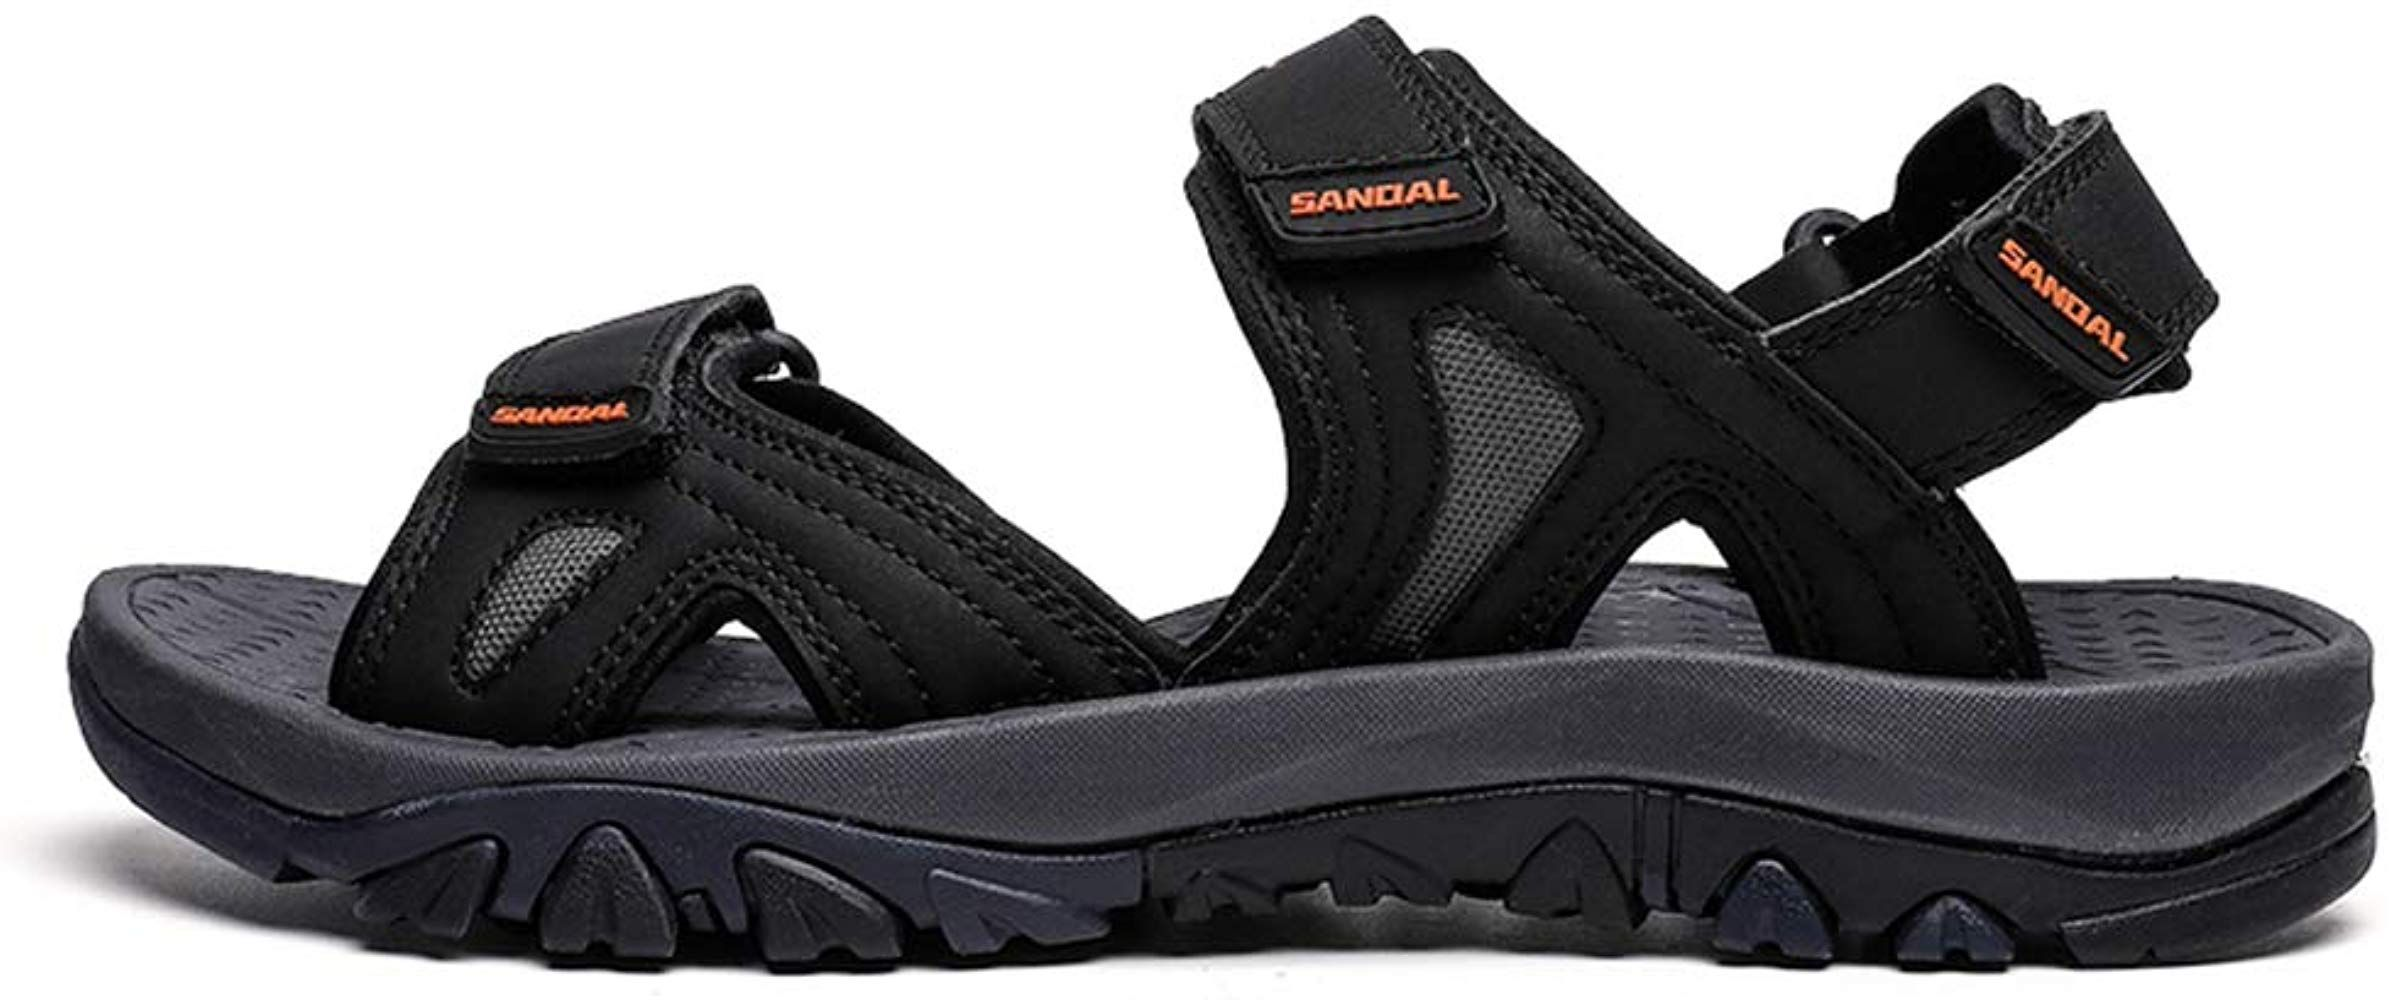 CMP Hamal Herren Outdoorsandale Wanderschuh Trekkingschuhe Sport Schuhe schwarz